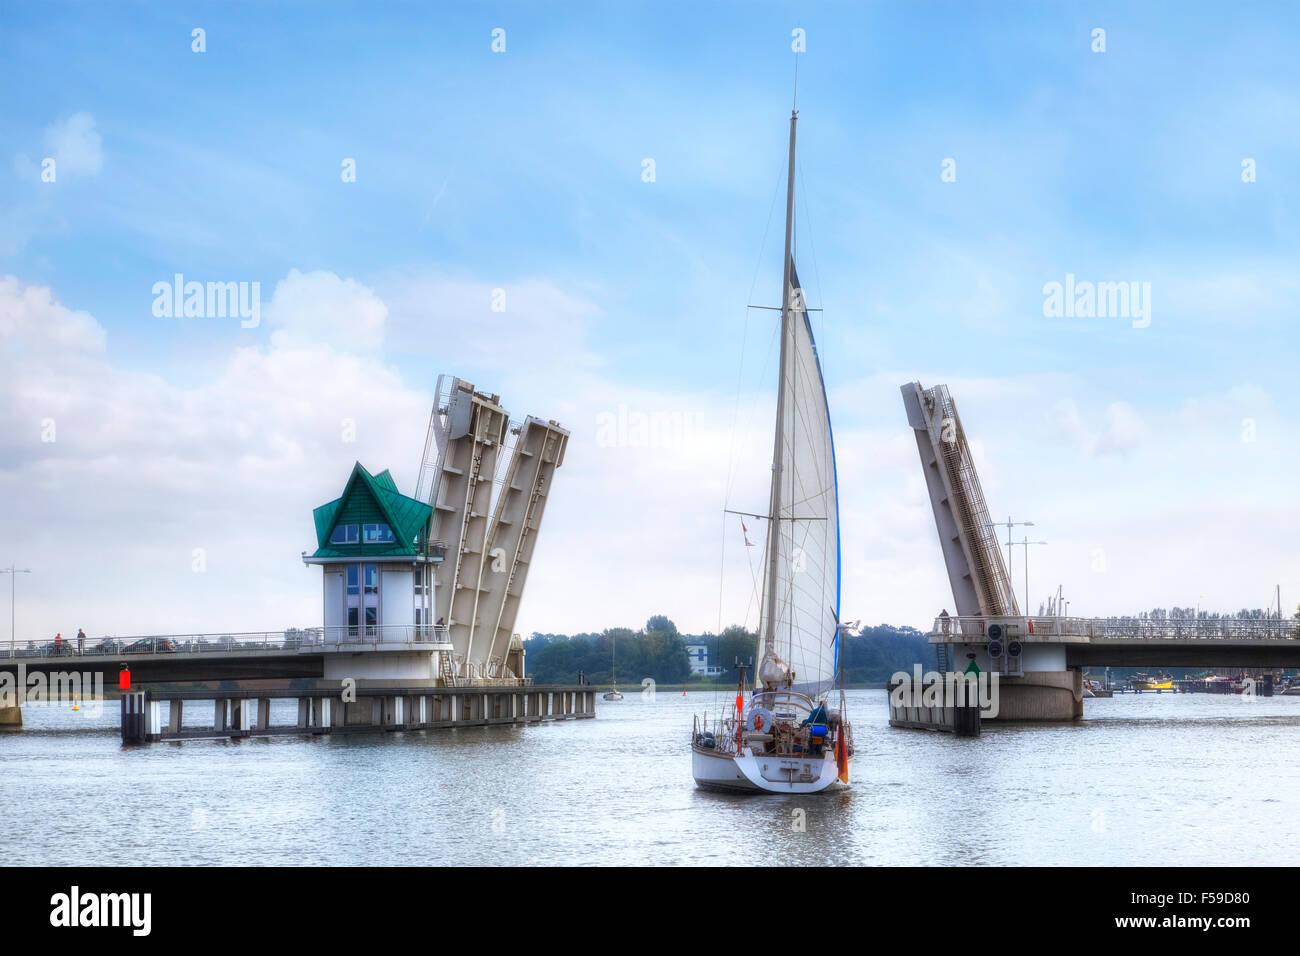 Kappeln, Schlei bridge, Schleswig-Holstein, Germany - Stock Image